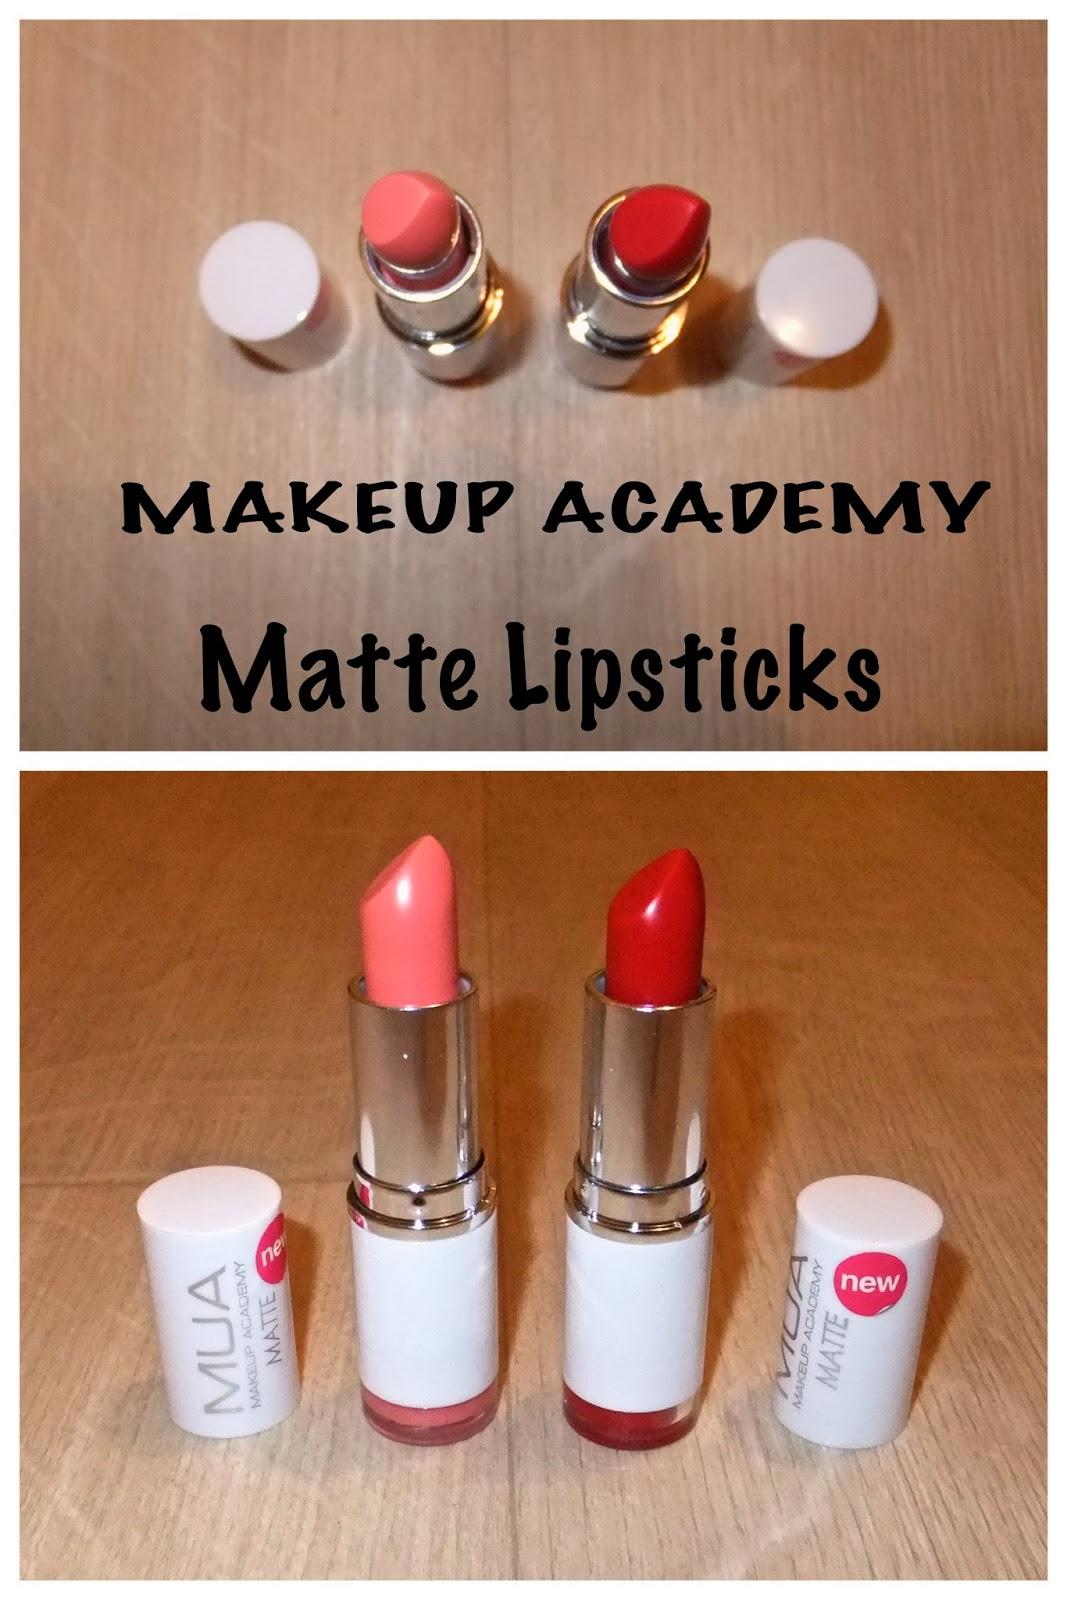 Review Mua Professional Eye Primer: The Make-up Family: Review: MUA Matte Lipsticks